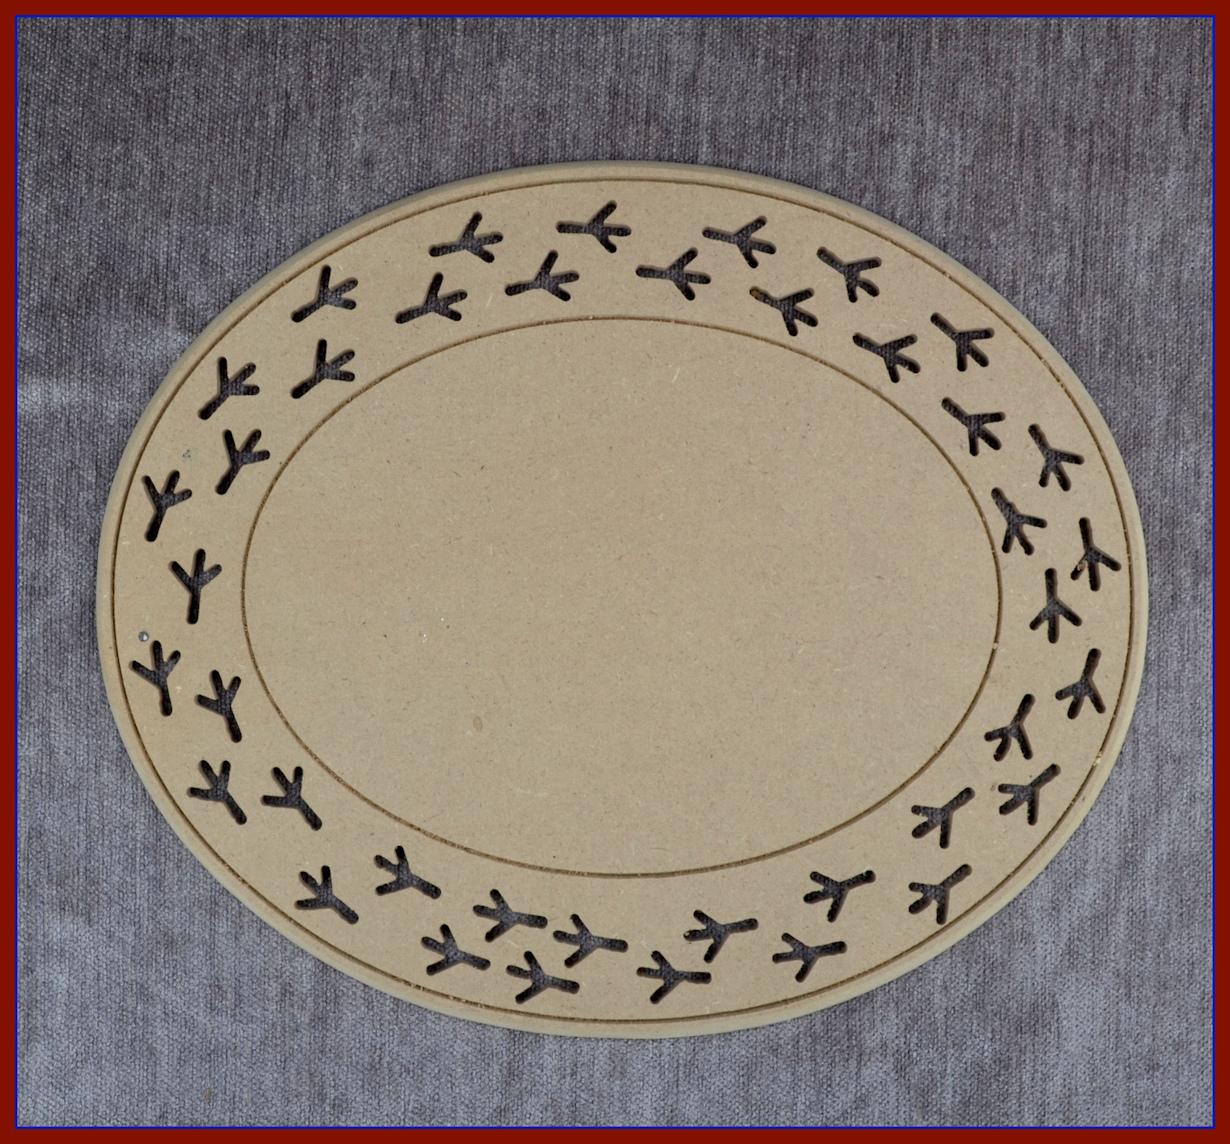 lw-birdfeet-oval-13-x-11-framed.jpg